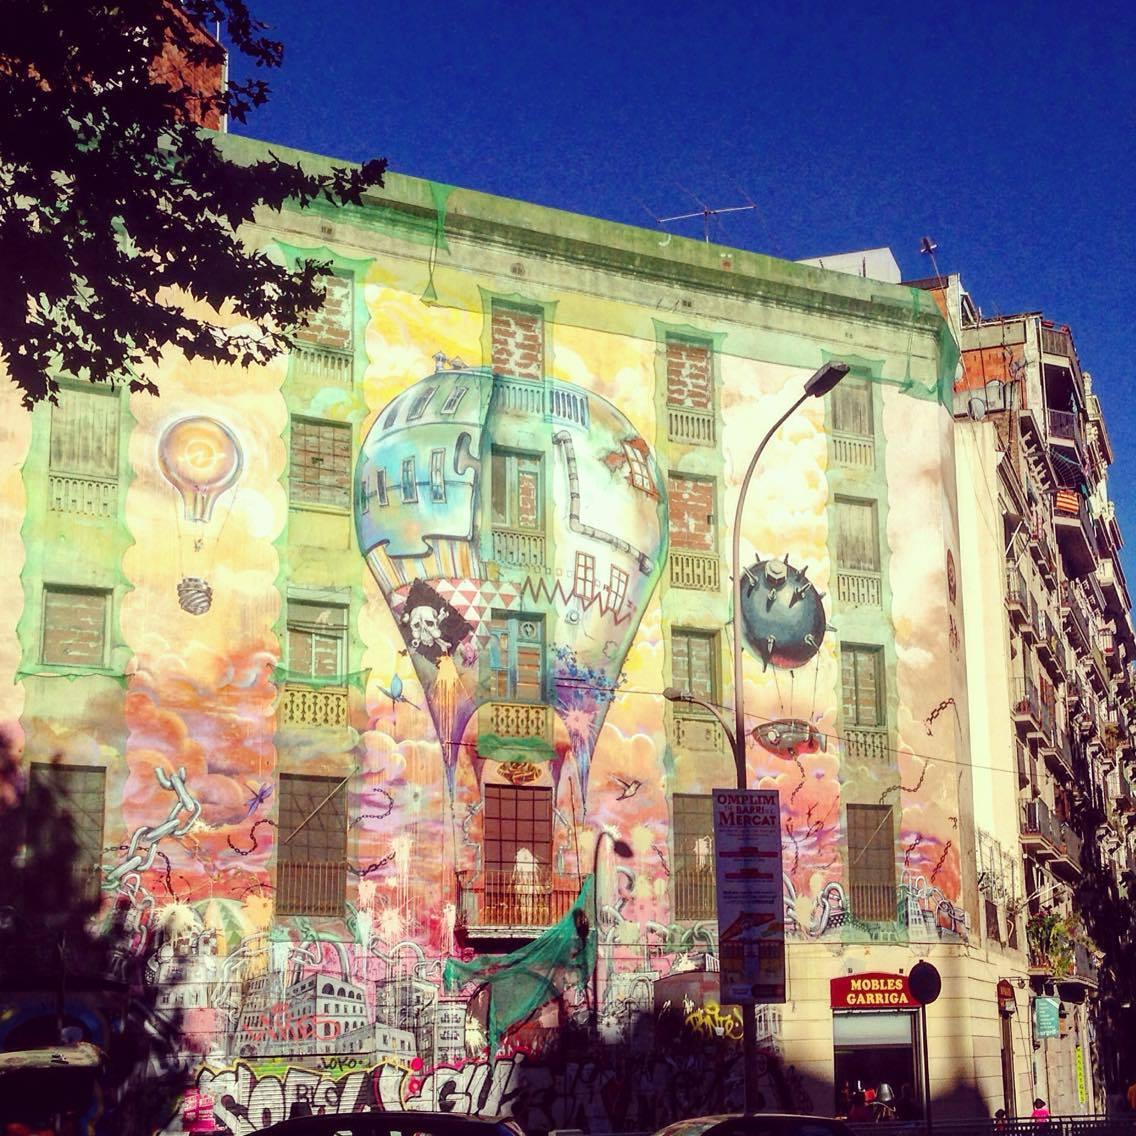 The graffiti-enhanced La Carboneria building in Barcelona's trendy Sant Antoni neighbourhood.